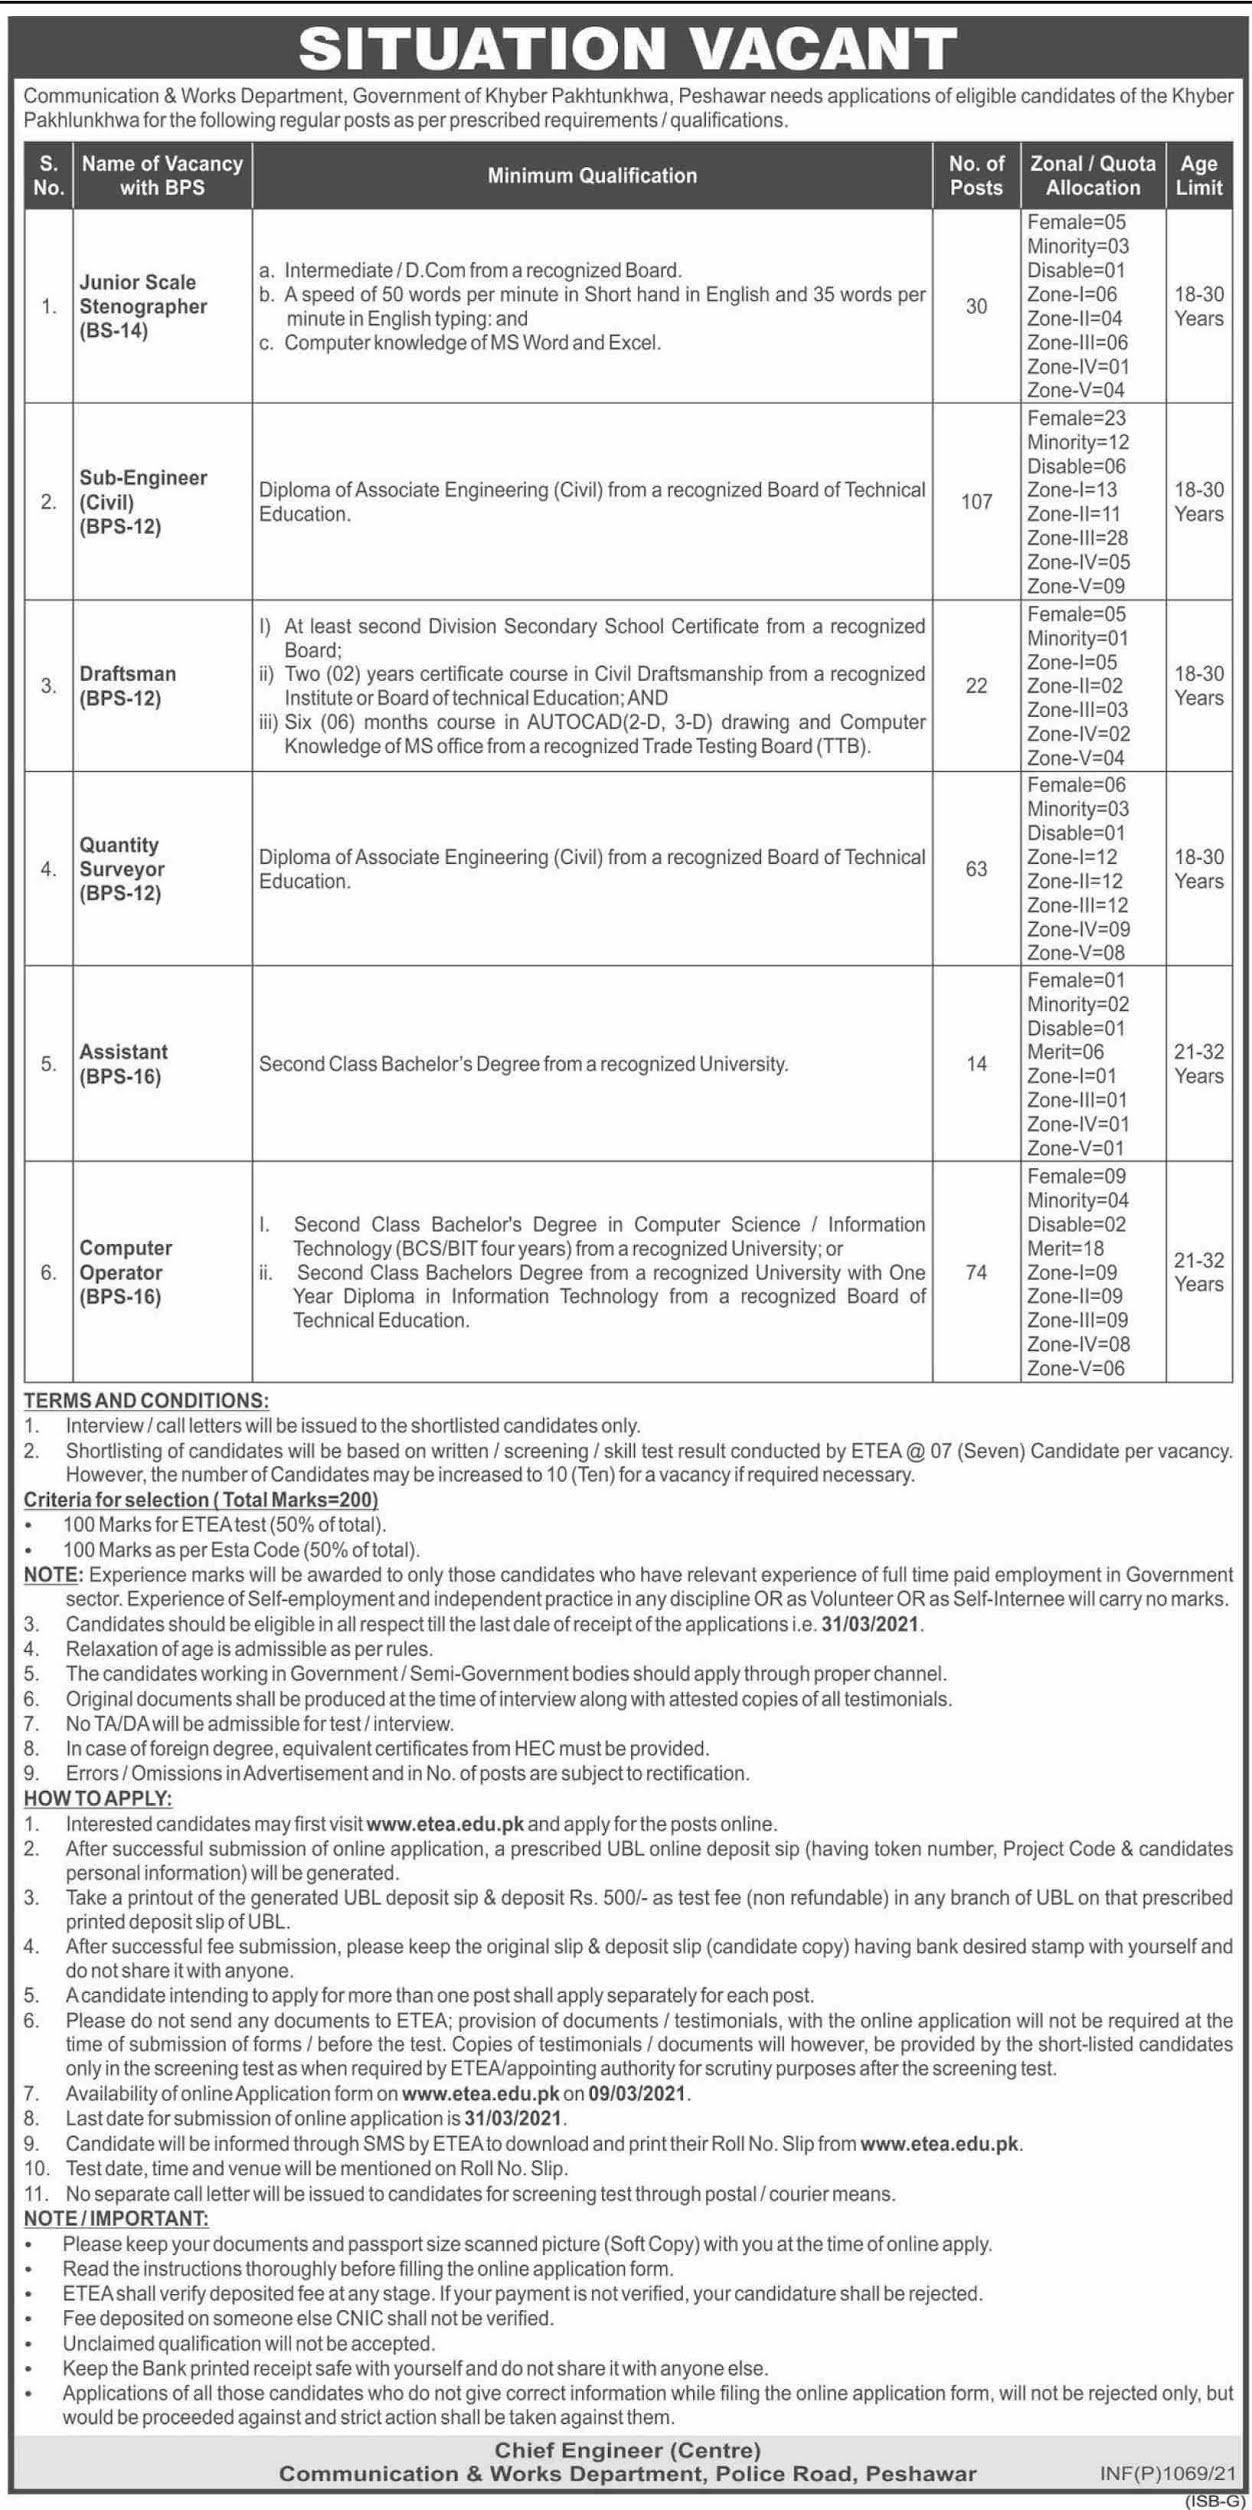 Download Communication & Works Department Jobs 2021 Application Form :- www.etea.edu.pk - Civil Engineer Jobs 2021 - Draftsman Jobs 2021 - Computer Operator Jobs 2021